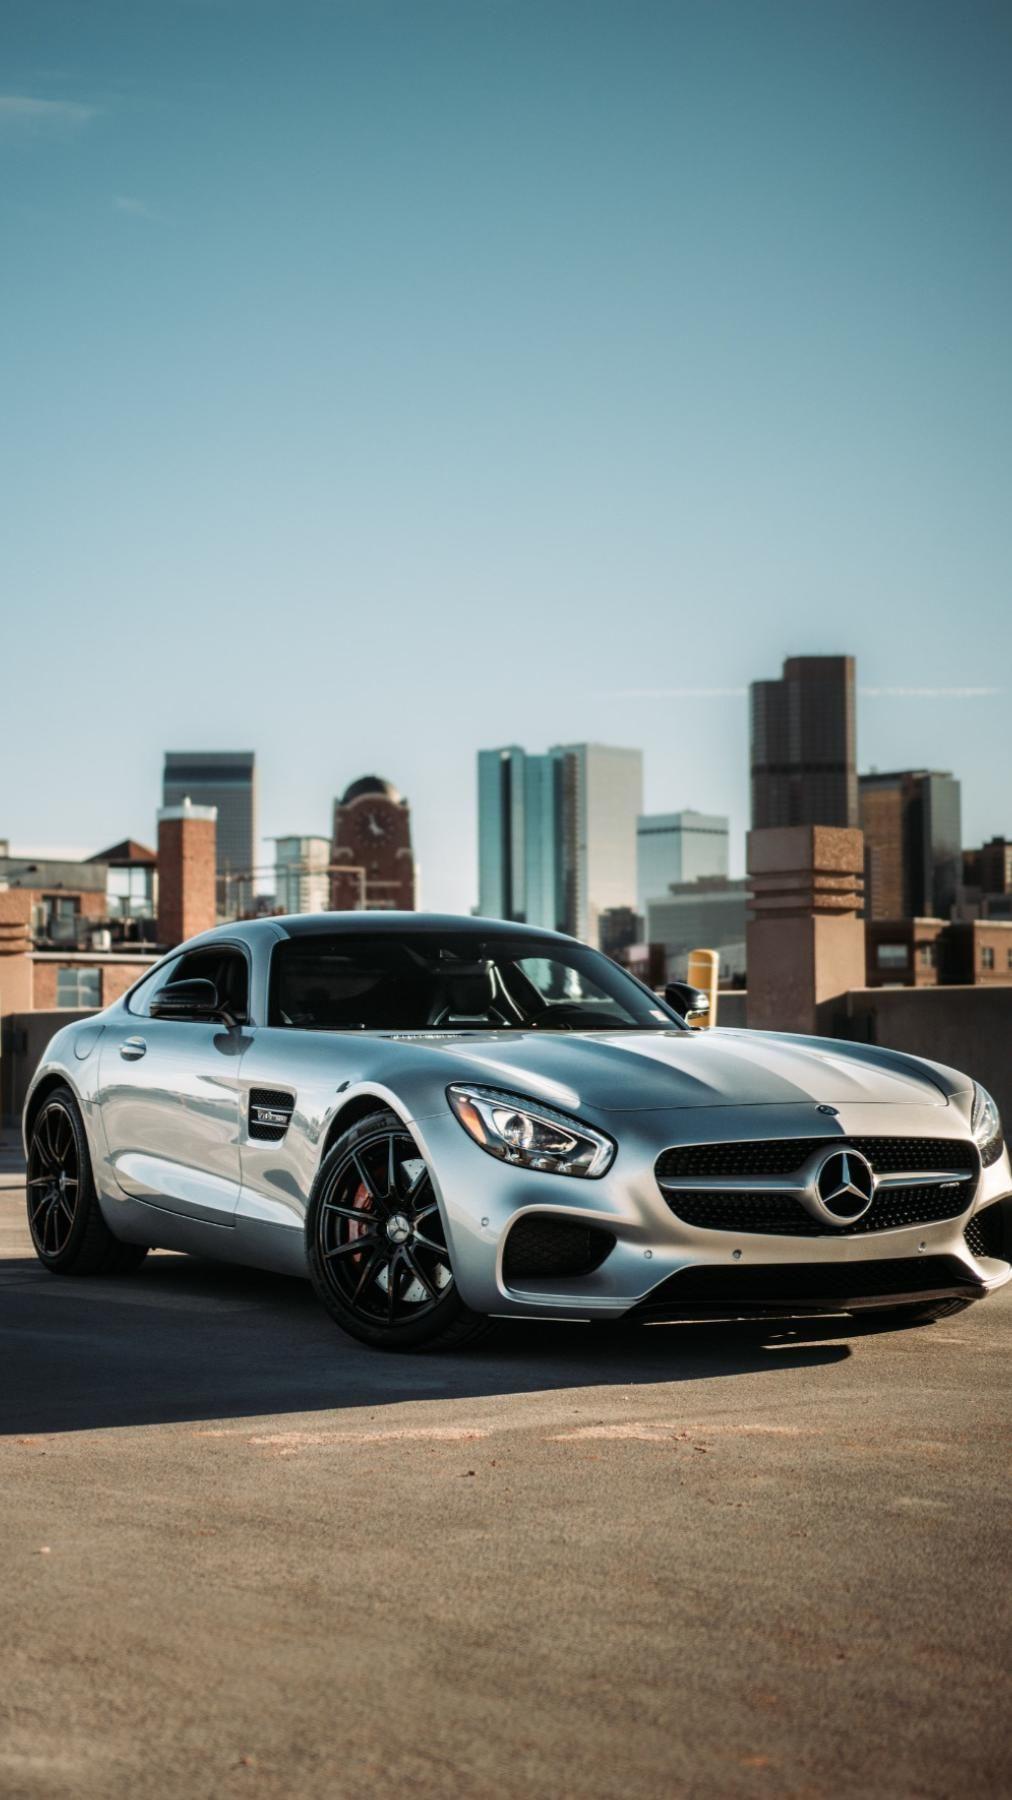 Mercedes Benz AMG GTR | Who loves Mercedes Benz?